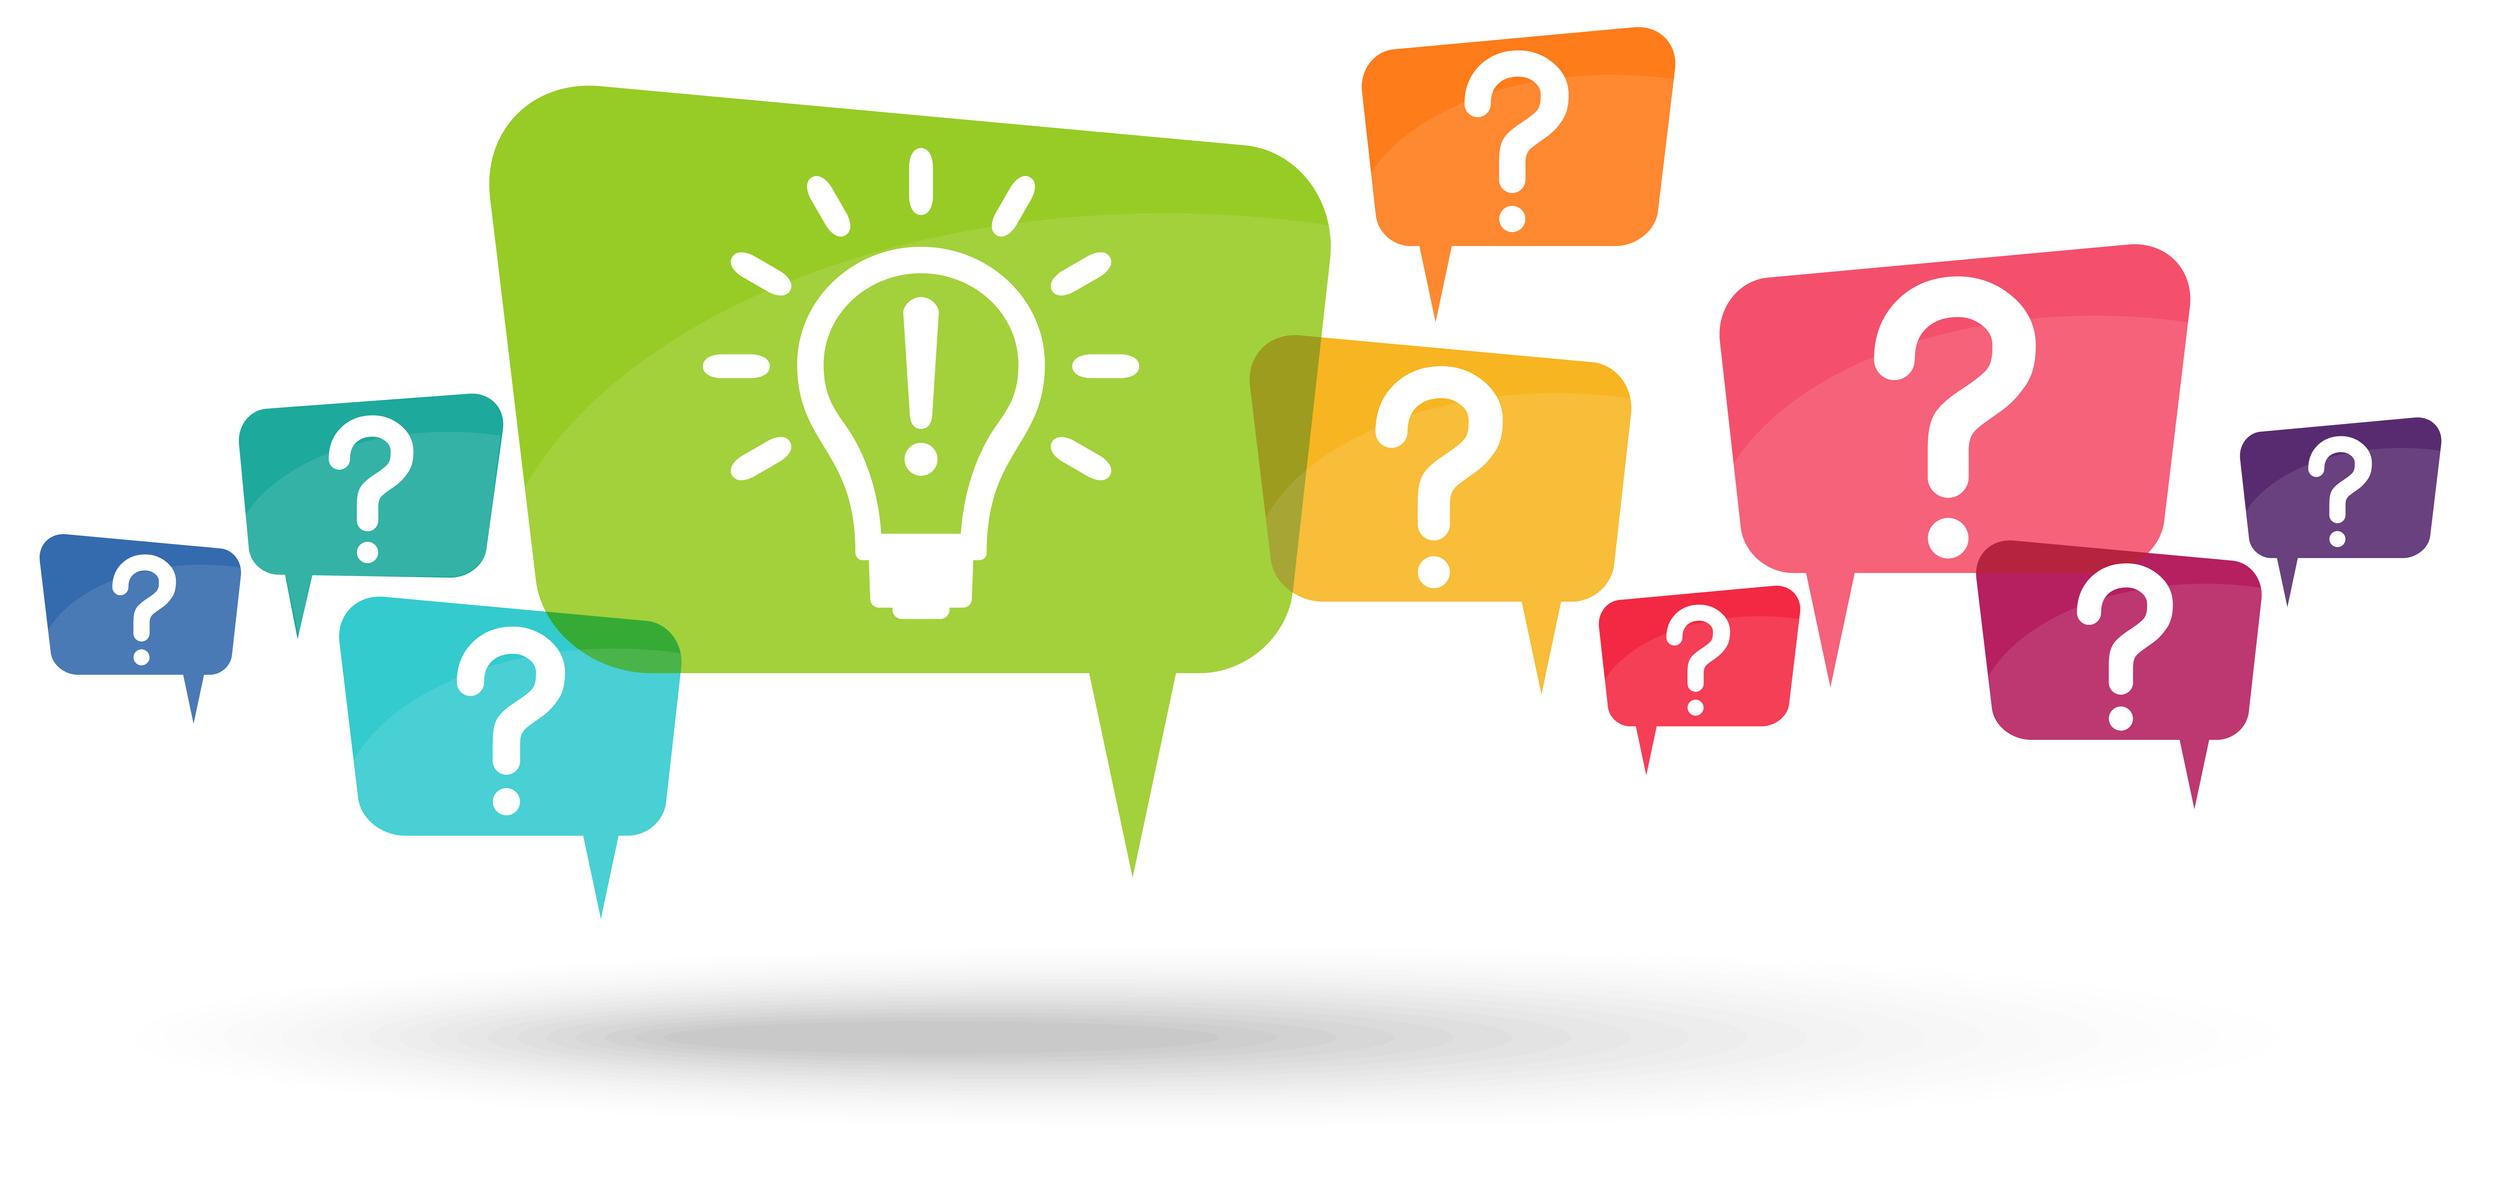 Question Marks And Idea Light Bulb Bubbles